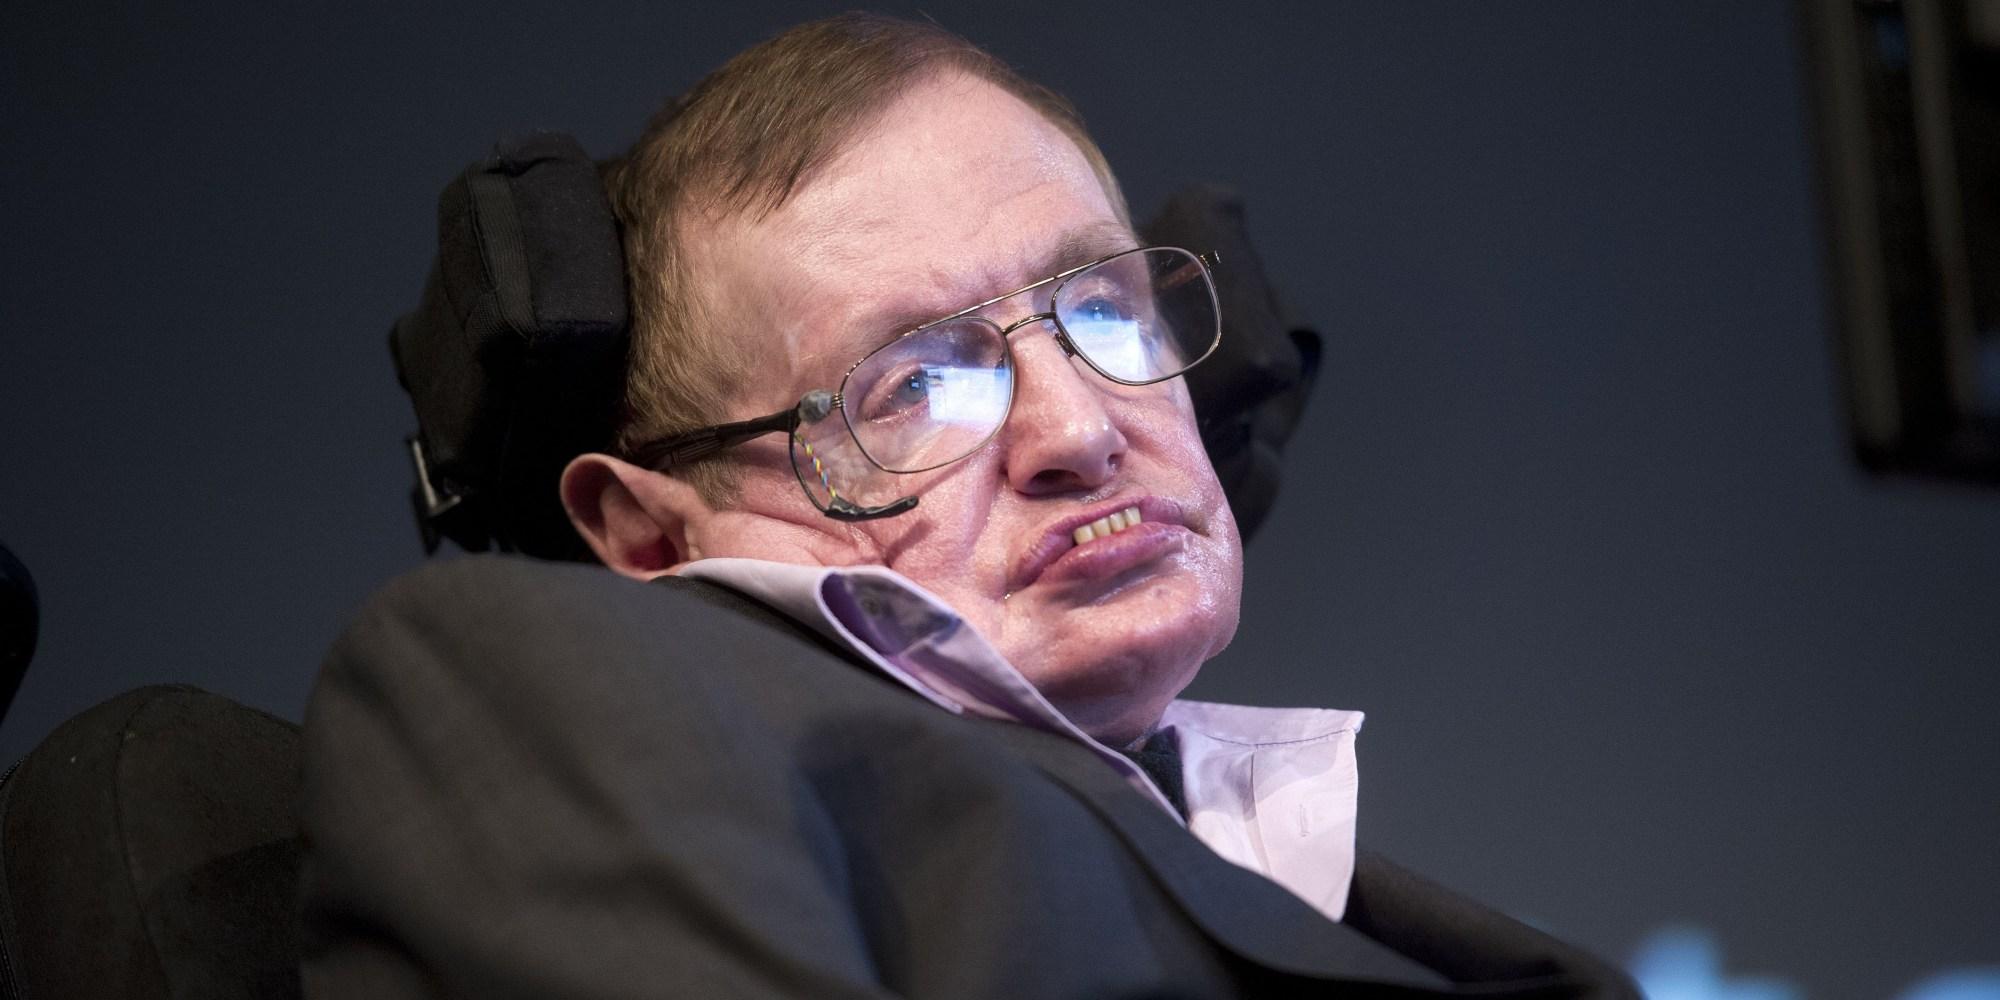 Stephen Hawking Calls Aggression The Human Failing He'd ... Stephen Hawking